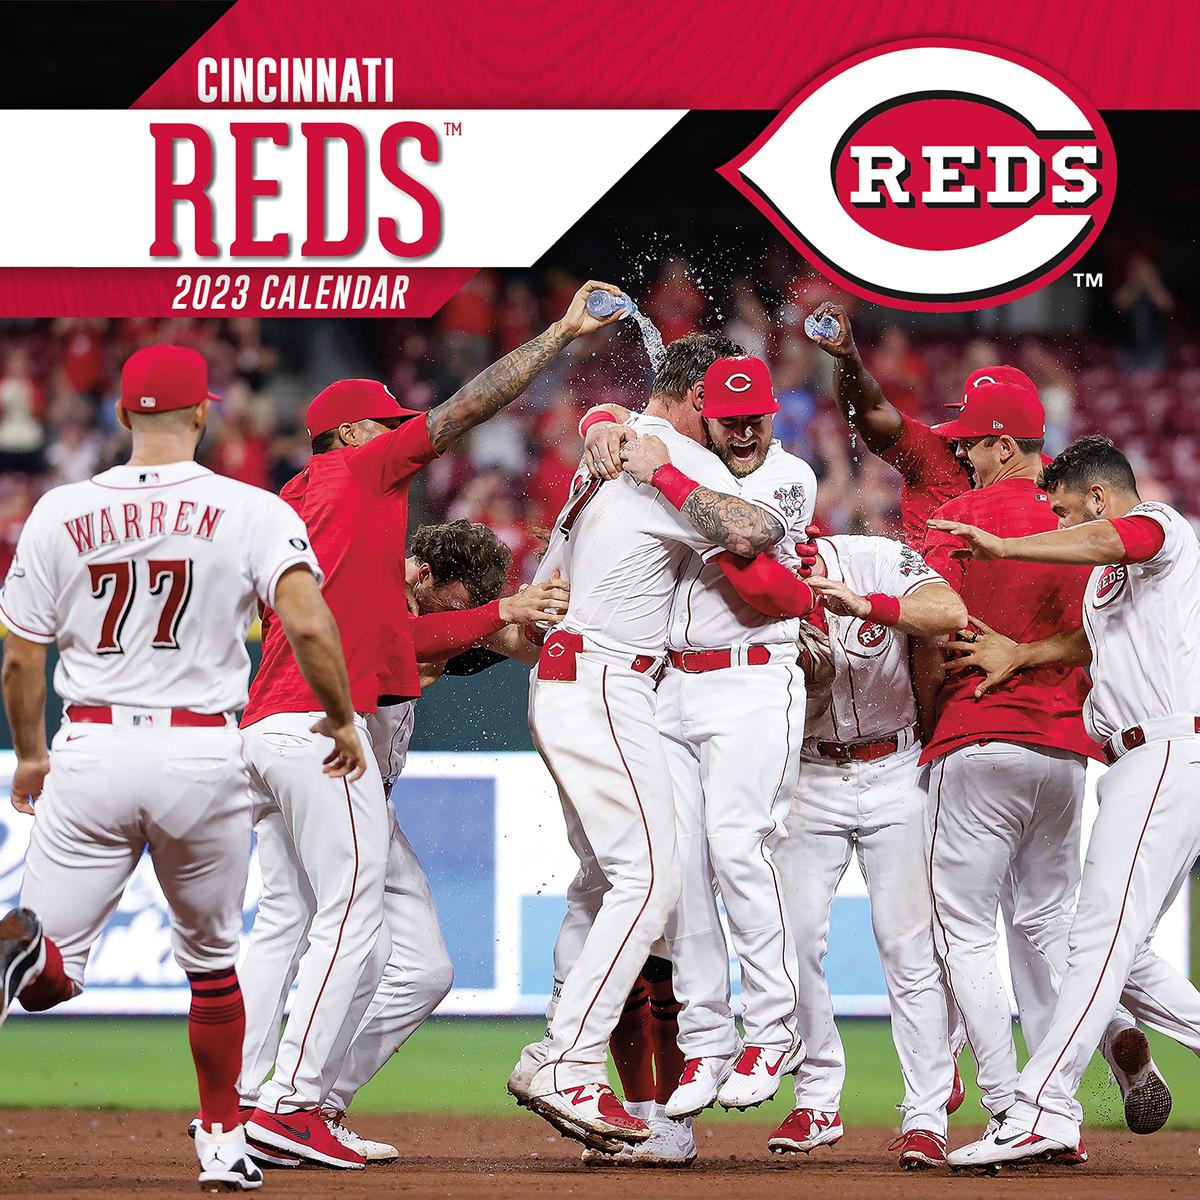 Cincinnati Reds 2019 Wall Calendar Buy At Khc Sports